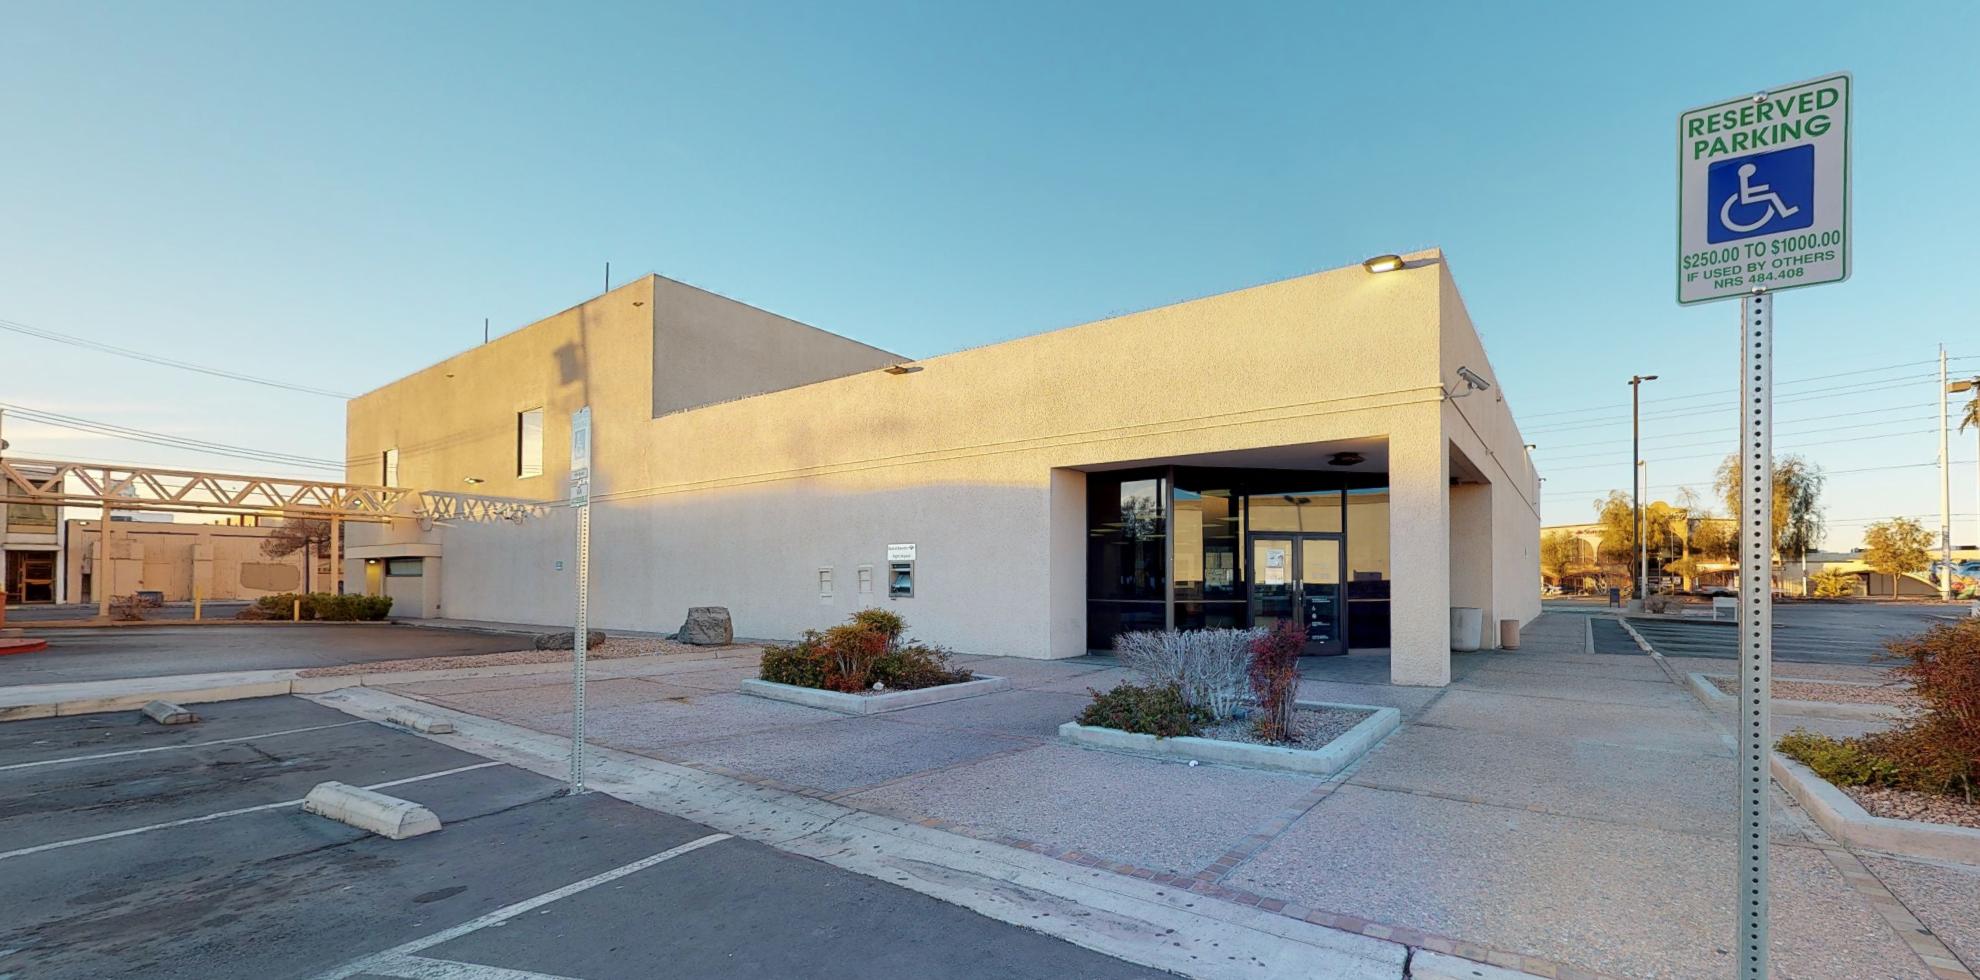 Bank of America financial center with drive-thru ATM | 1077 E Sahara Ave, Las Vegas, NV 89104